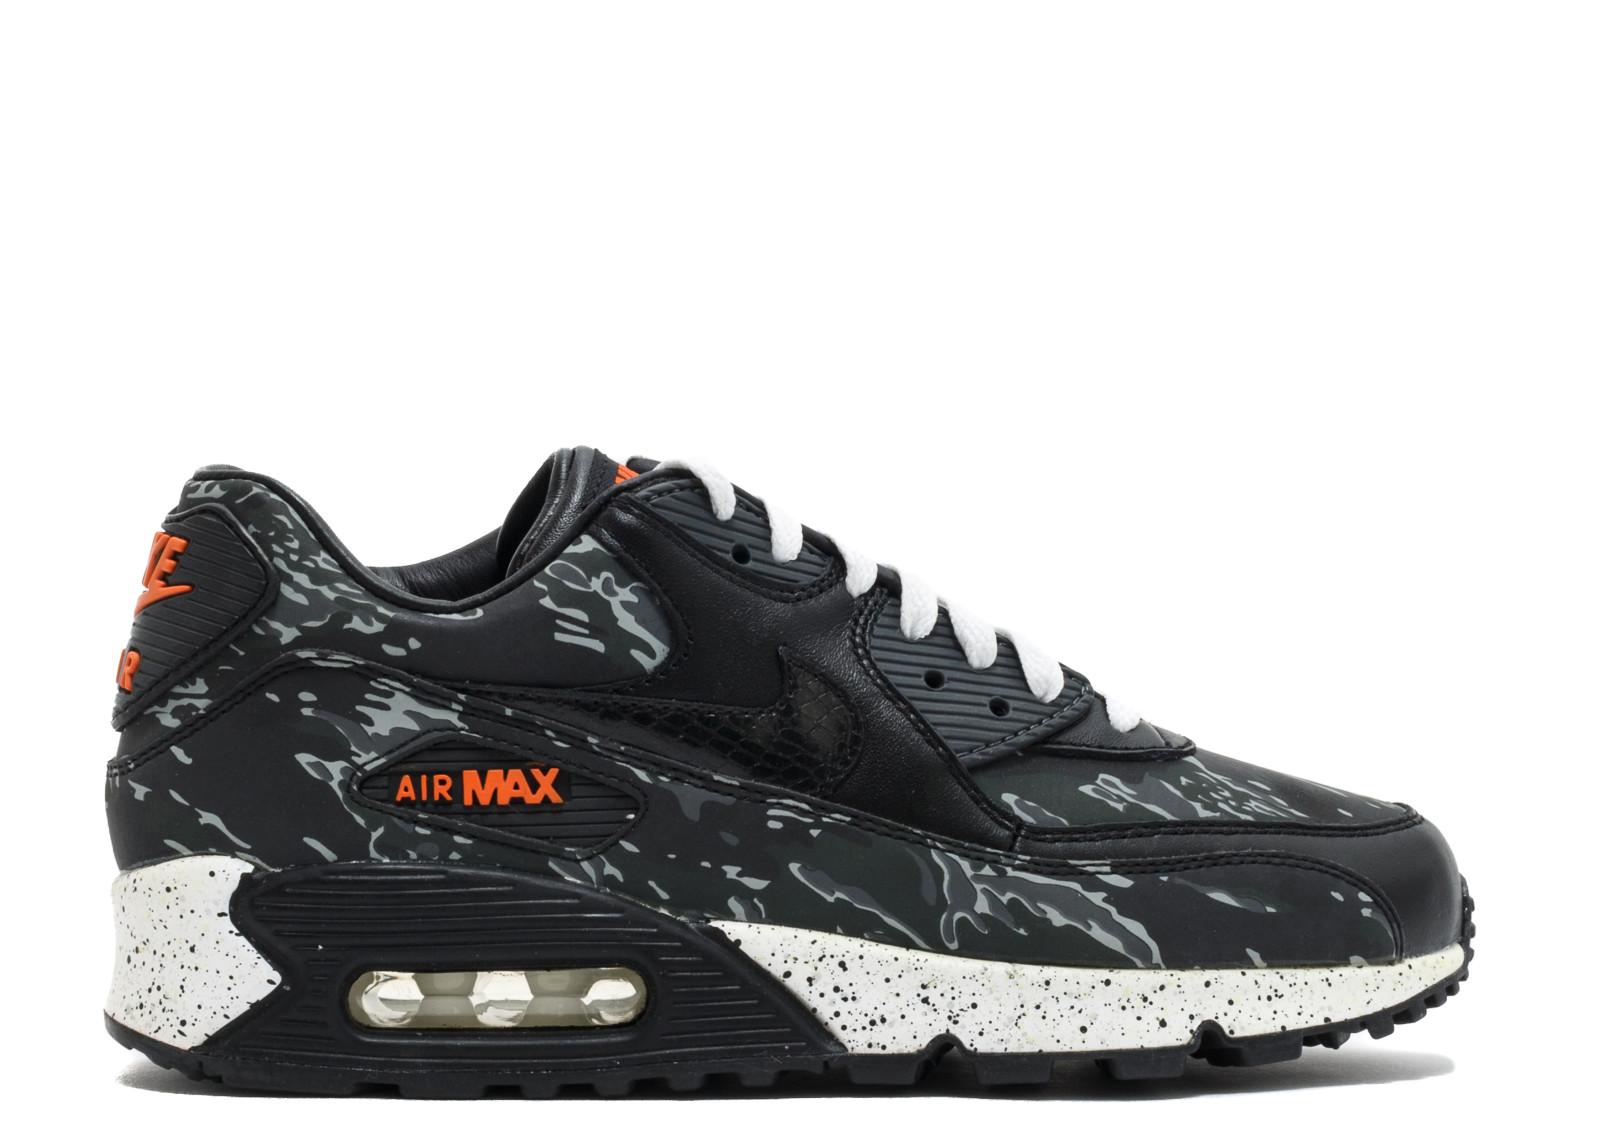 91b782acd0 Air Max 90 Atmos Black Tiger Camo